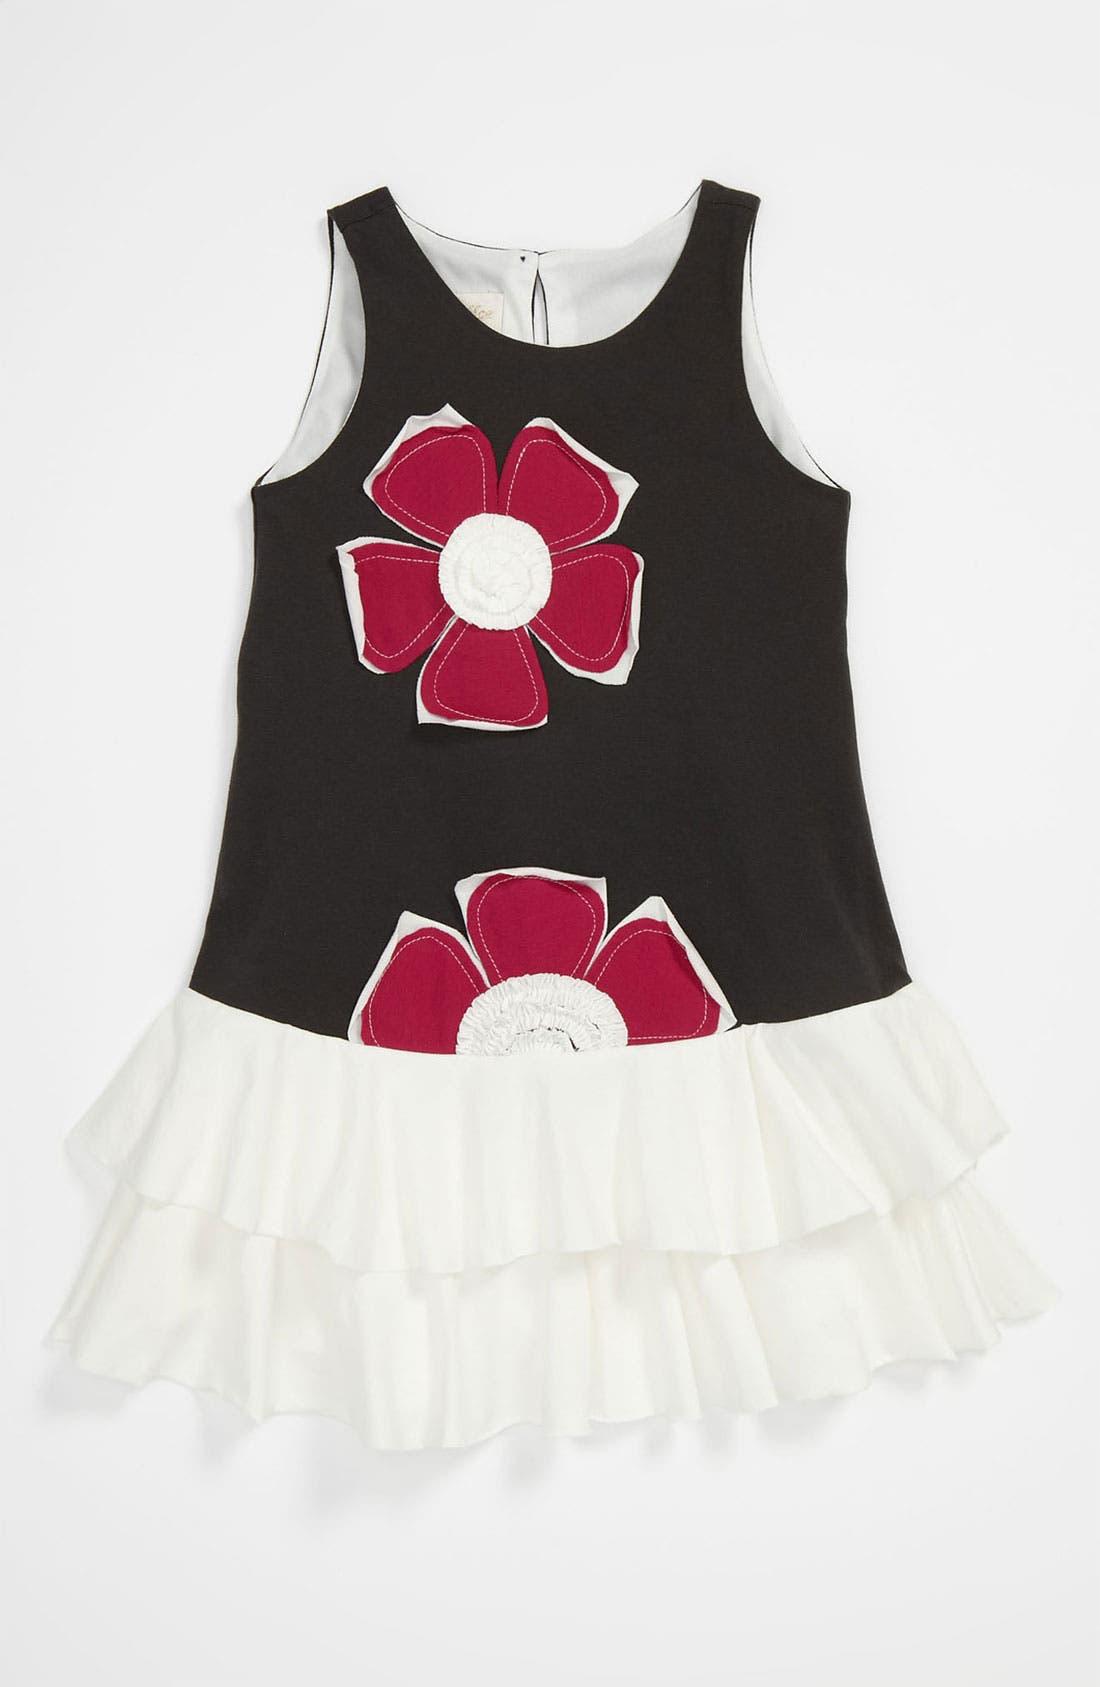 Alternate Image 1 Selected - Isobella & Chloe 'Holly' Dress (Toddler)